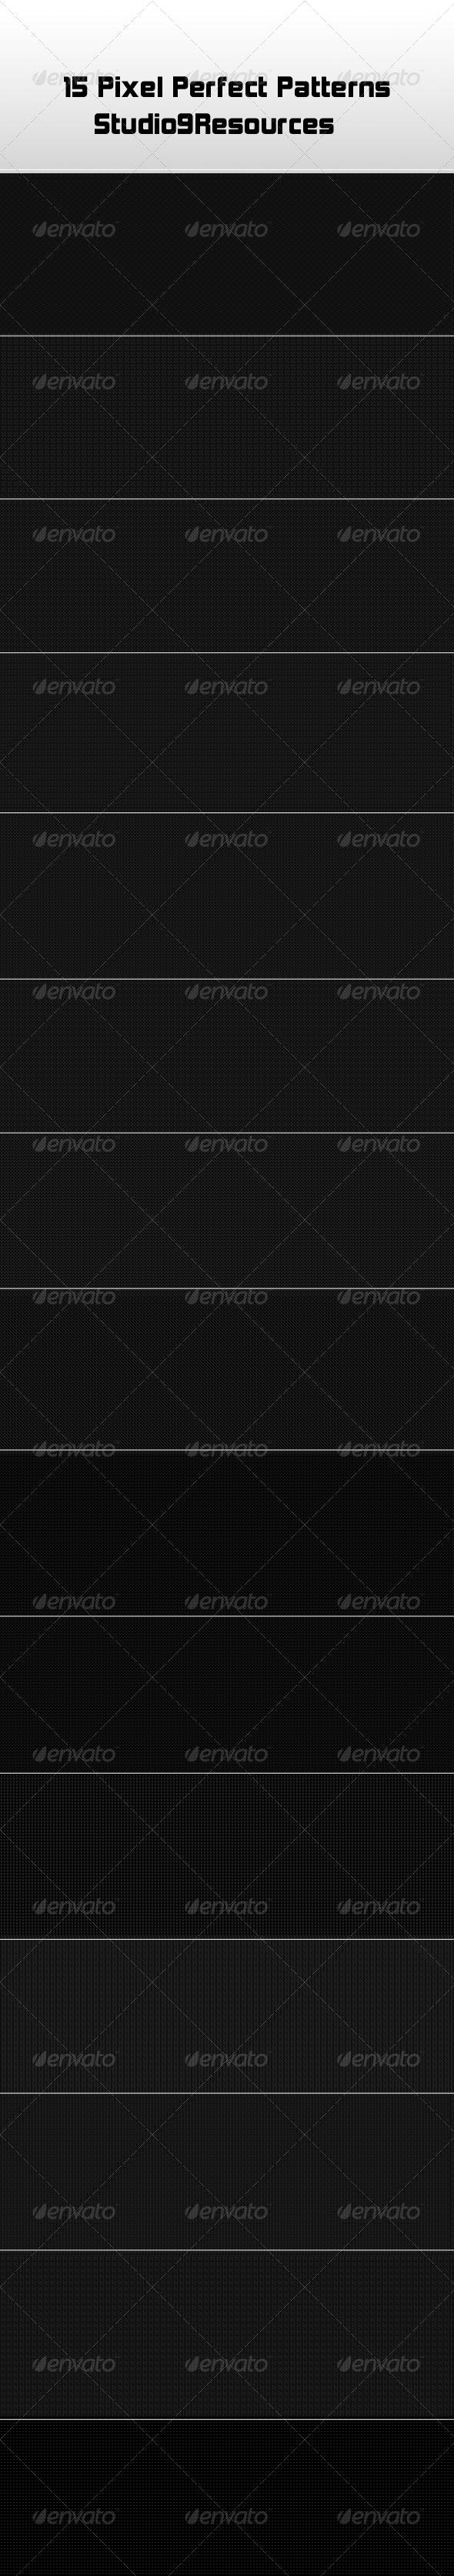 15 Pixel Perfect Patterns - Textures / Fills / Patterns Photoshop